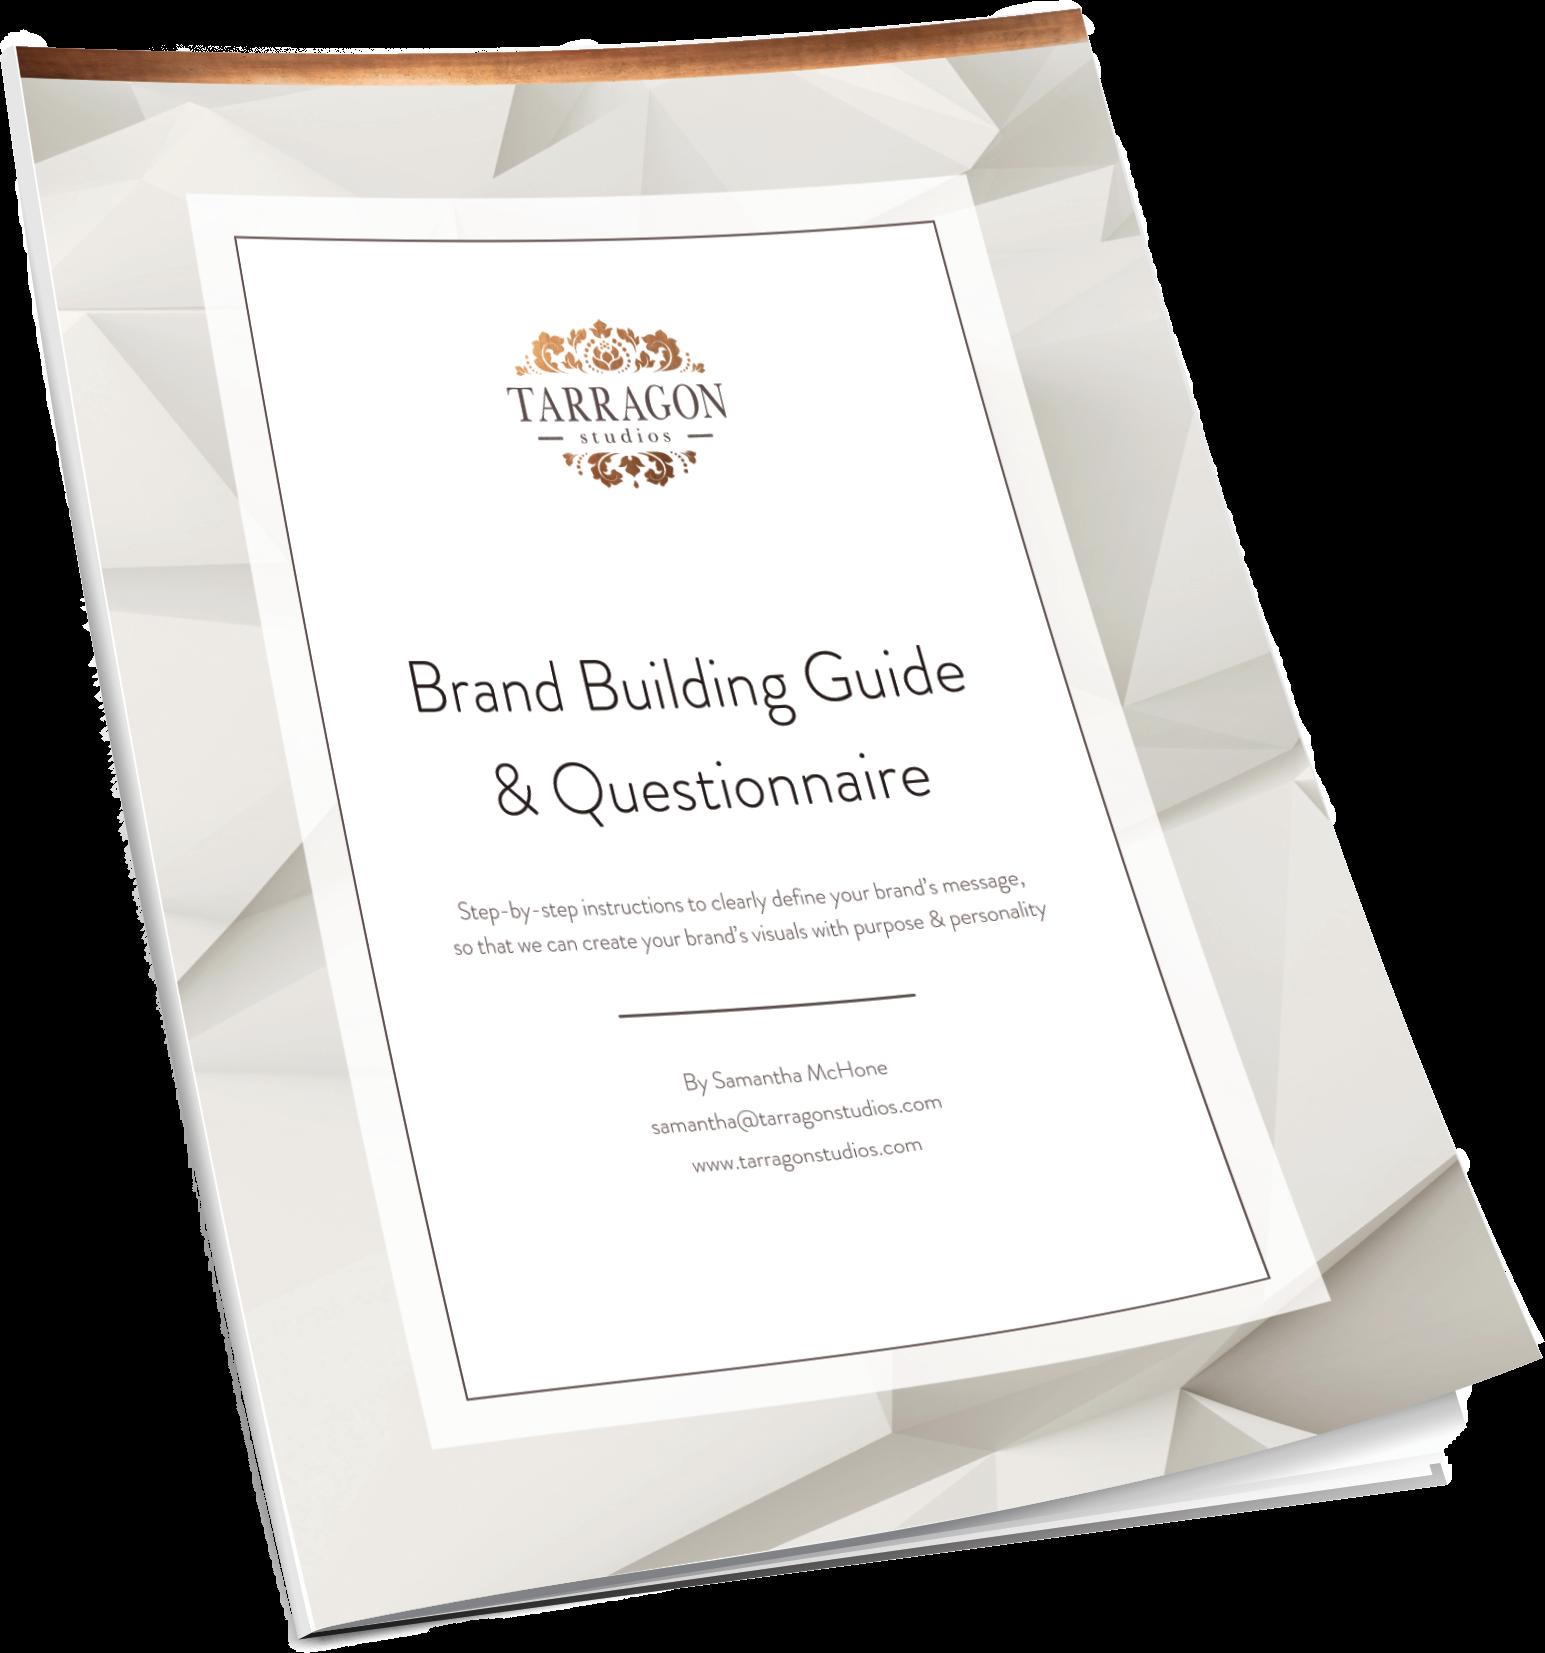 Brand Building Guide & Questionnaire by Tarragon Studios, LLC